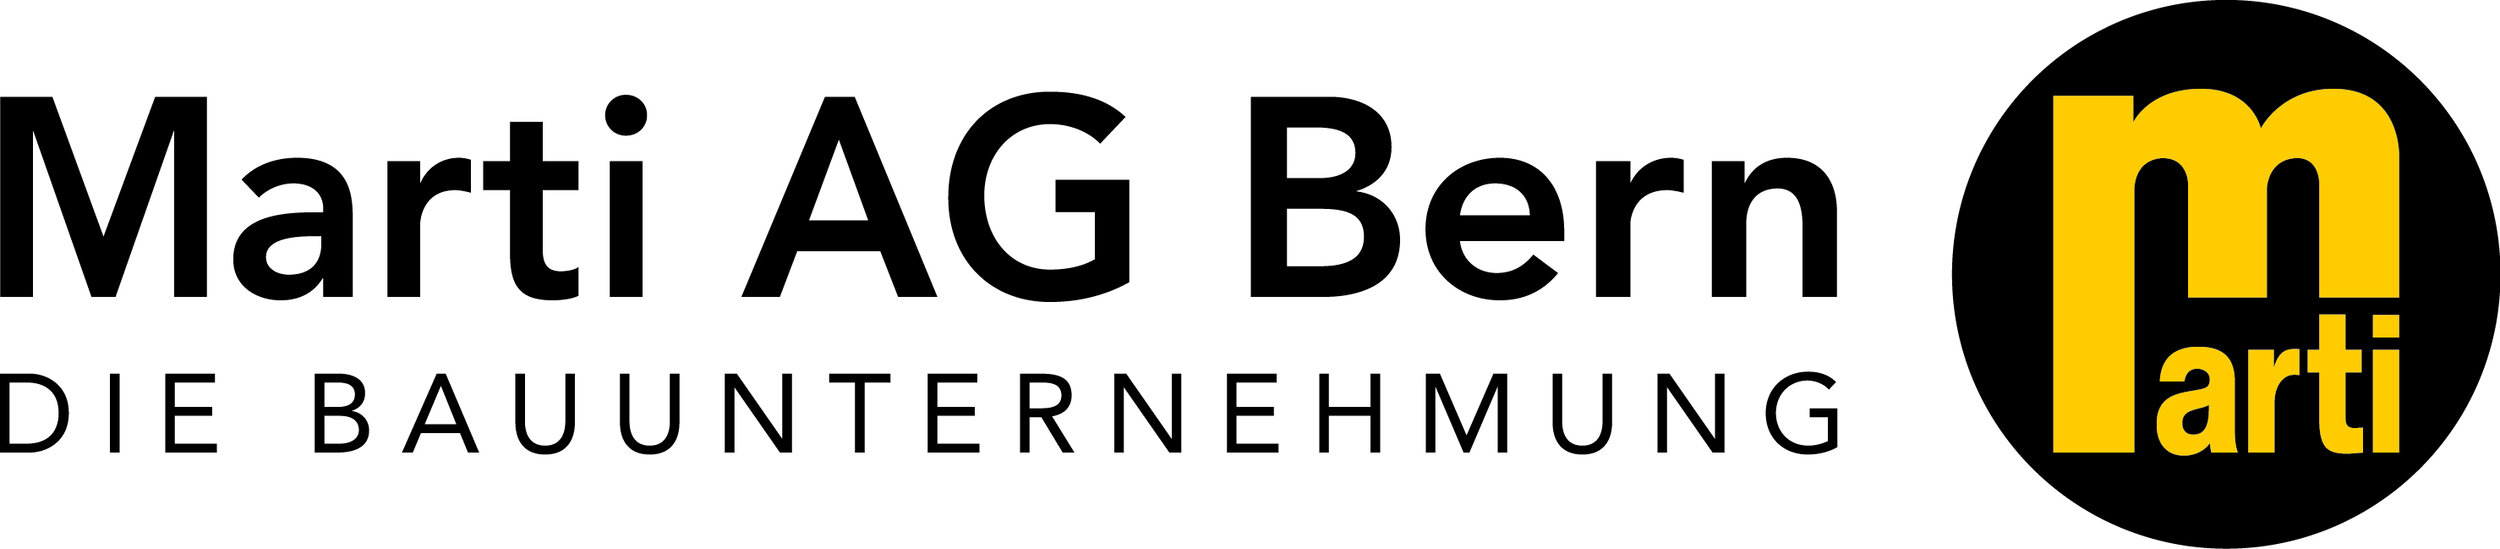 Marti AG Bern